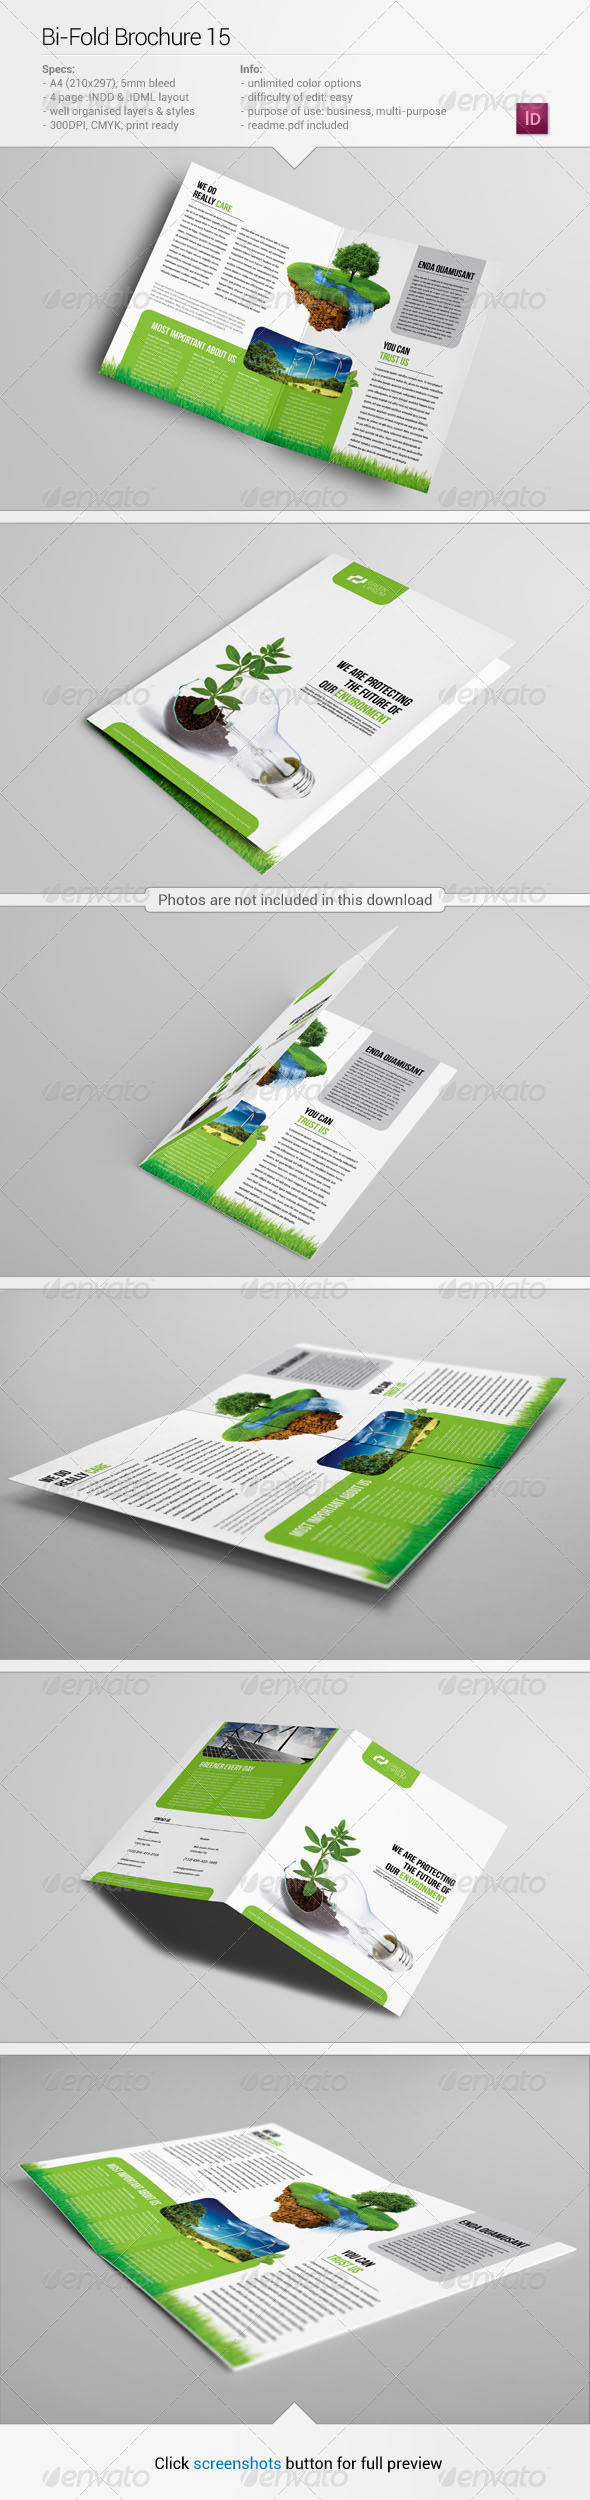 GraphicRiver Bi-Fold Brochure 15 5620448